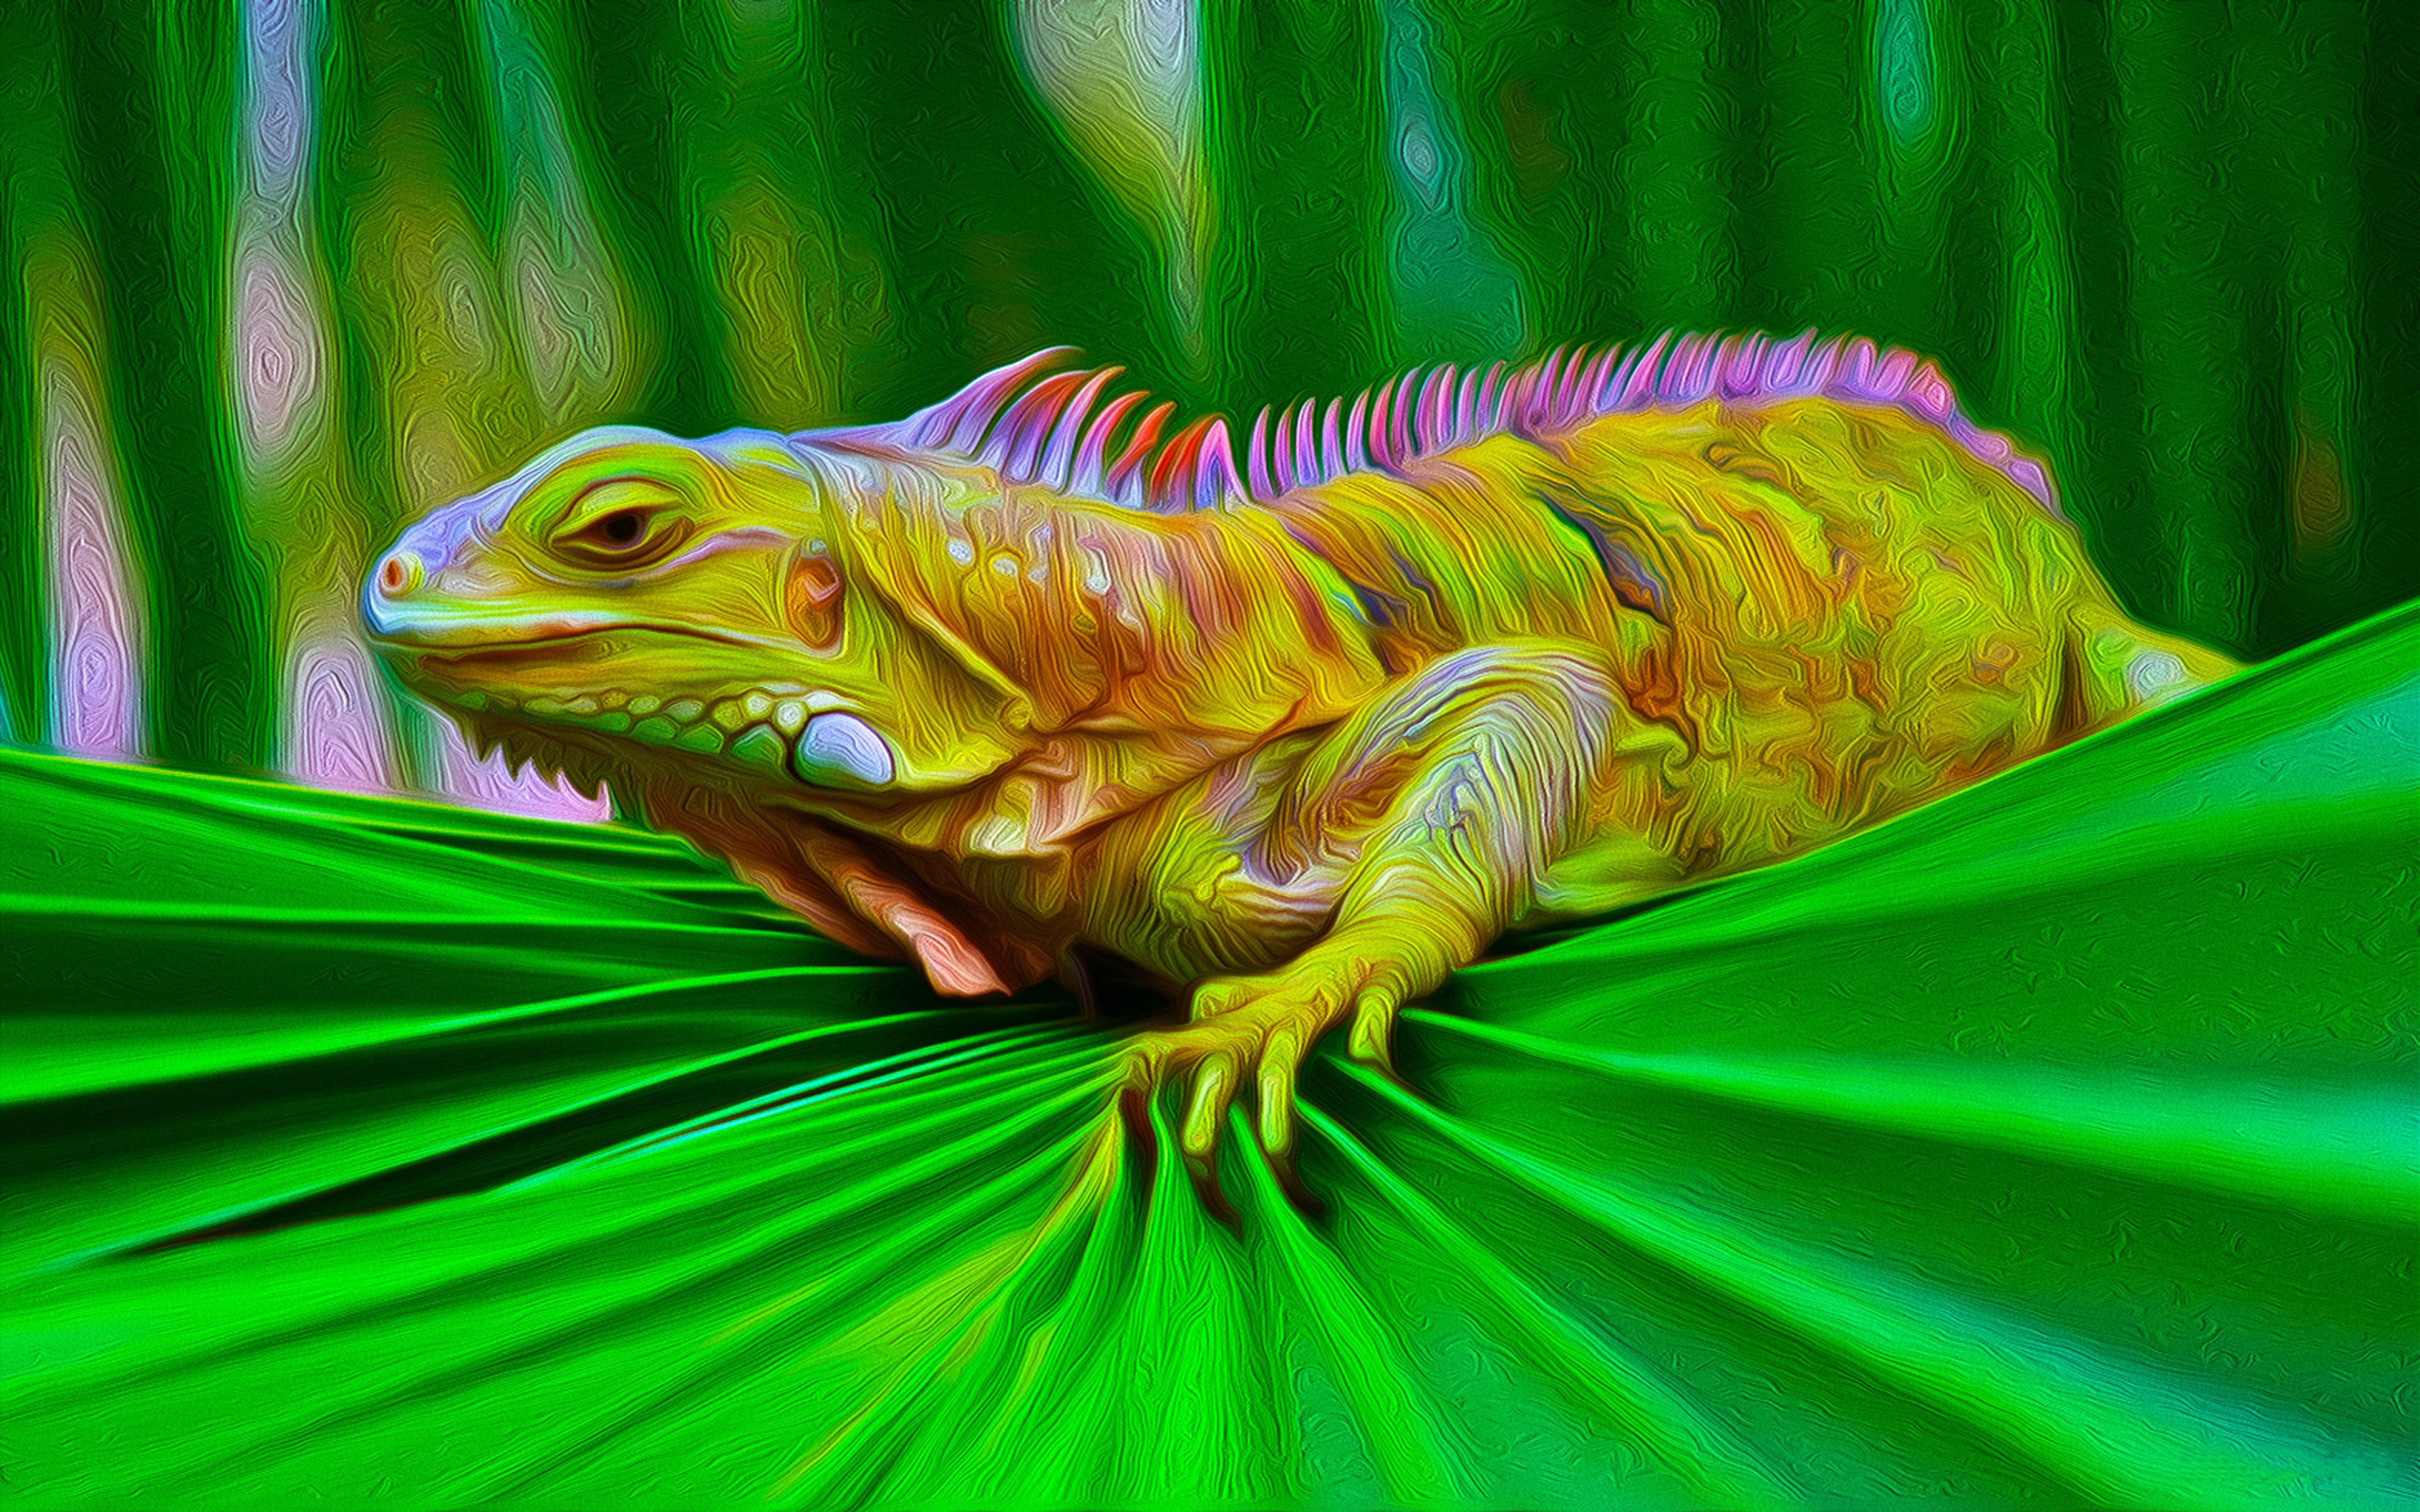 Iguana Colorful Lizard Computer Digital Art For Your